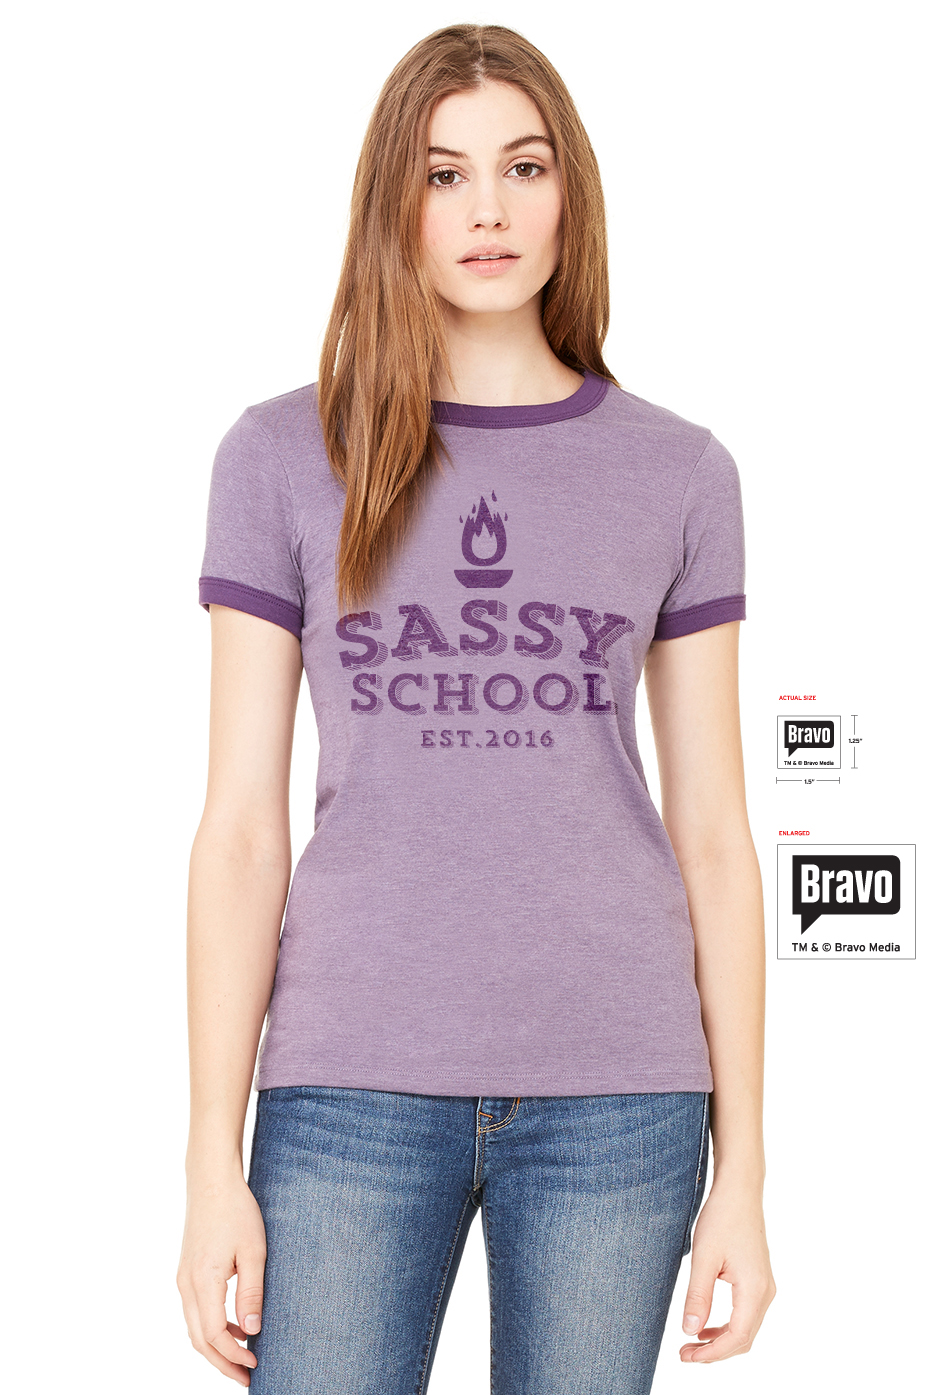 SASSY_SCHOOL.jpg